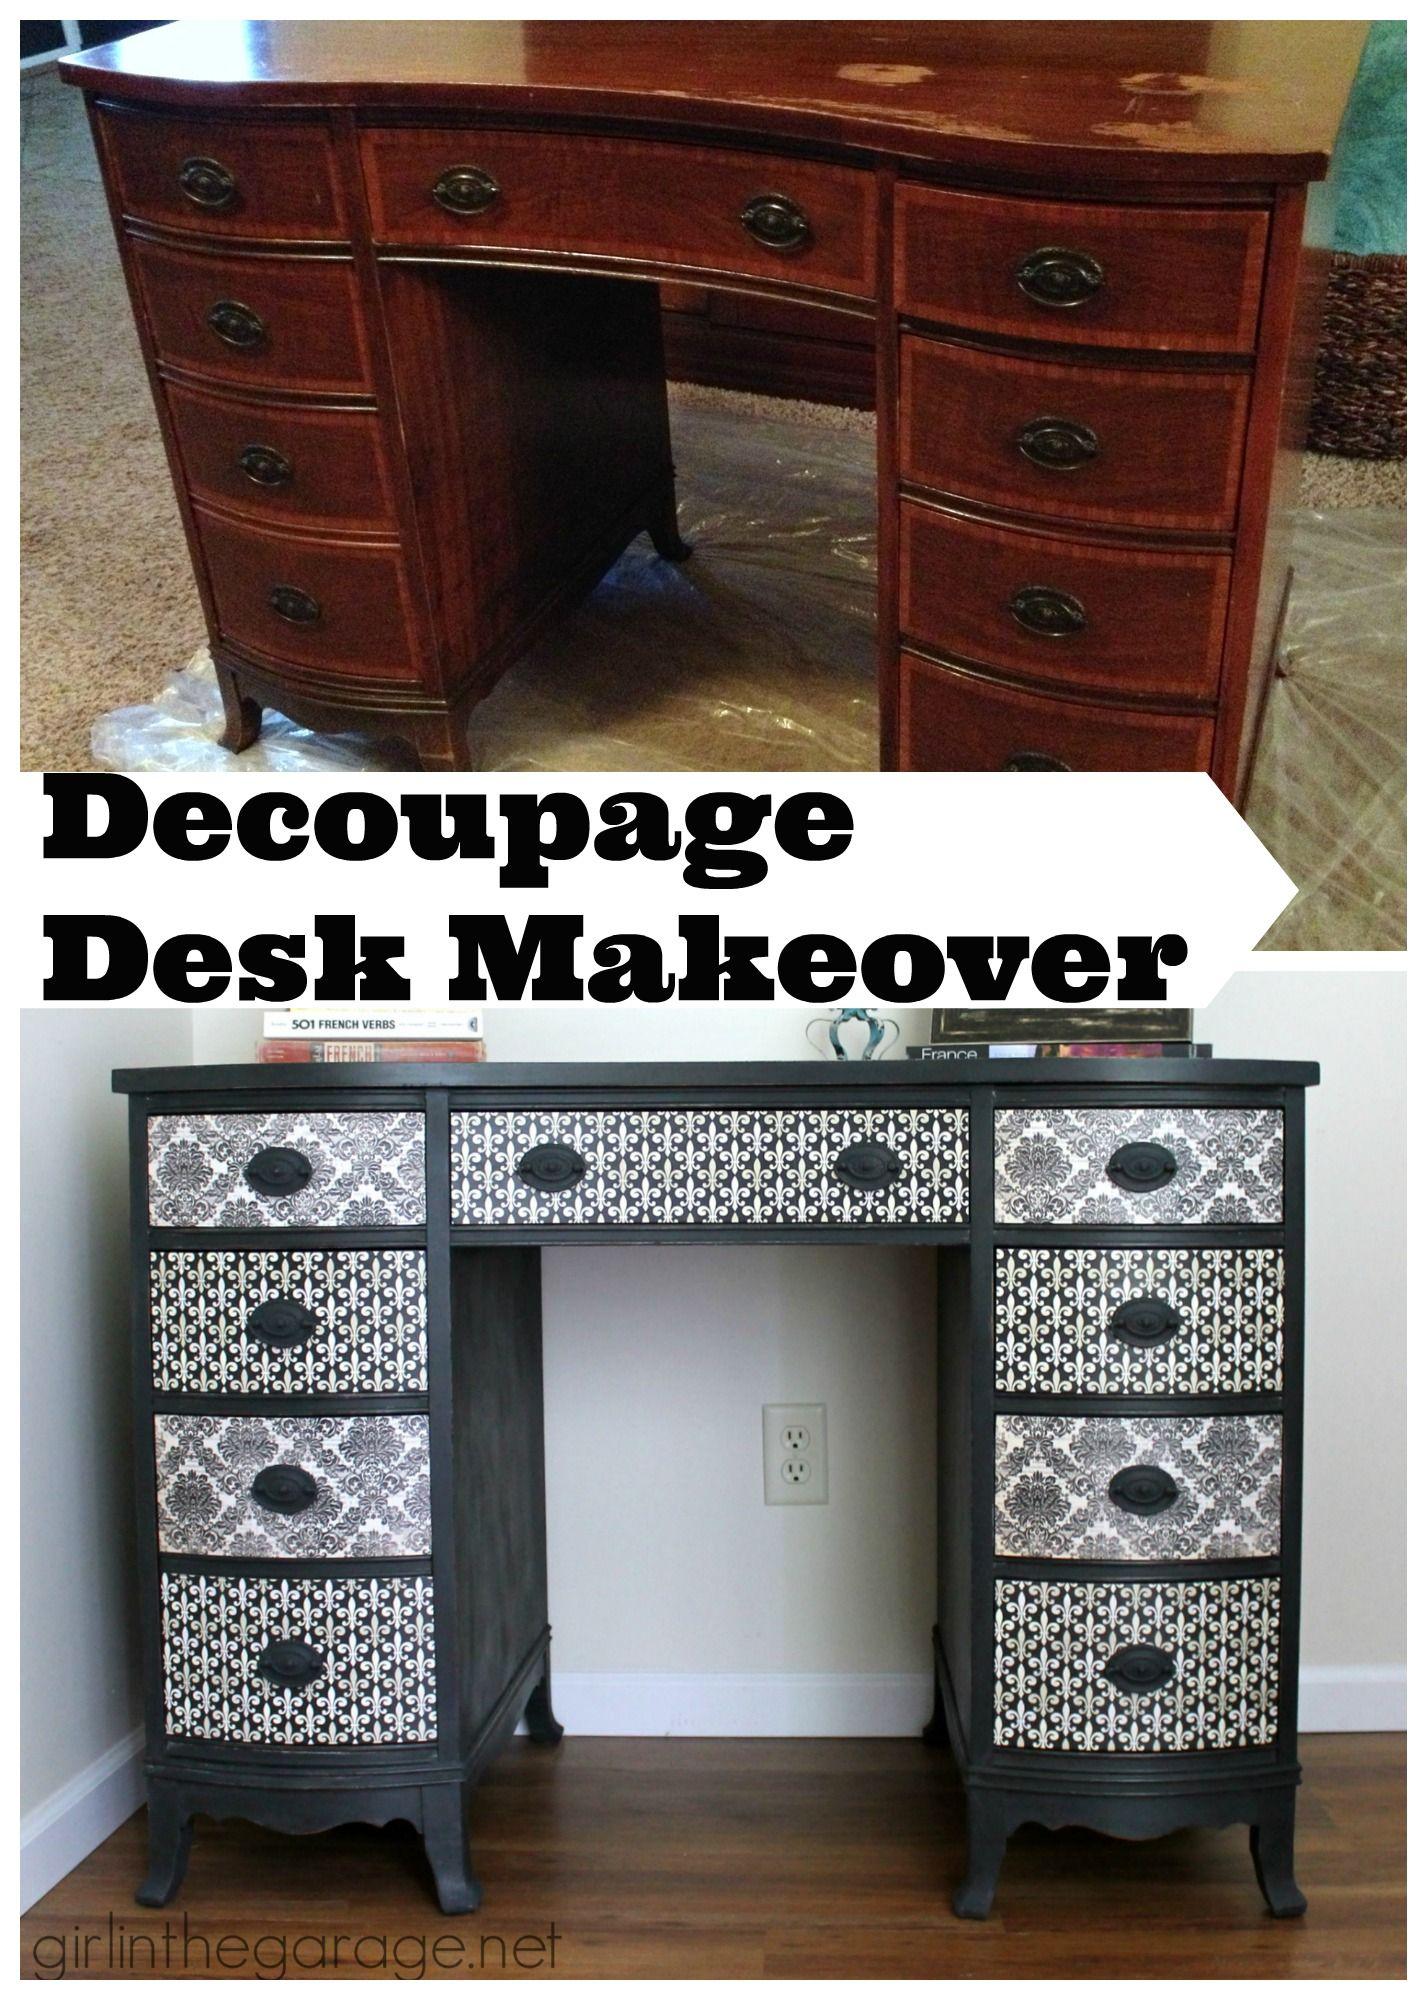 Furniture ideas Decoupage Desk Makeover Trash